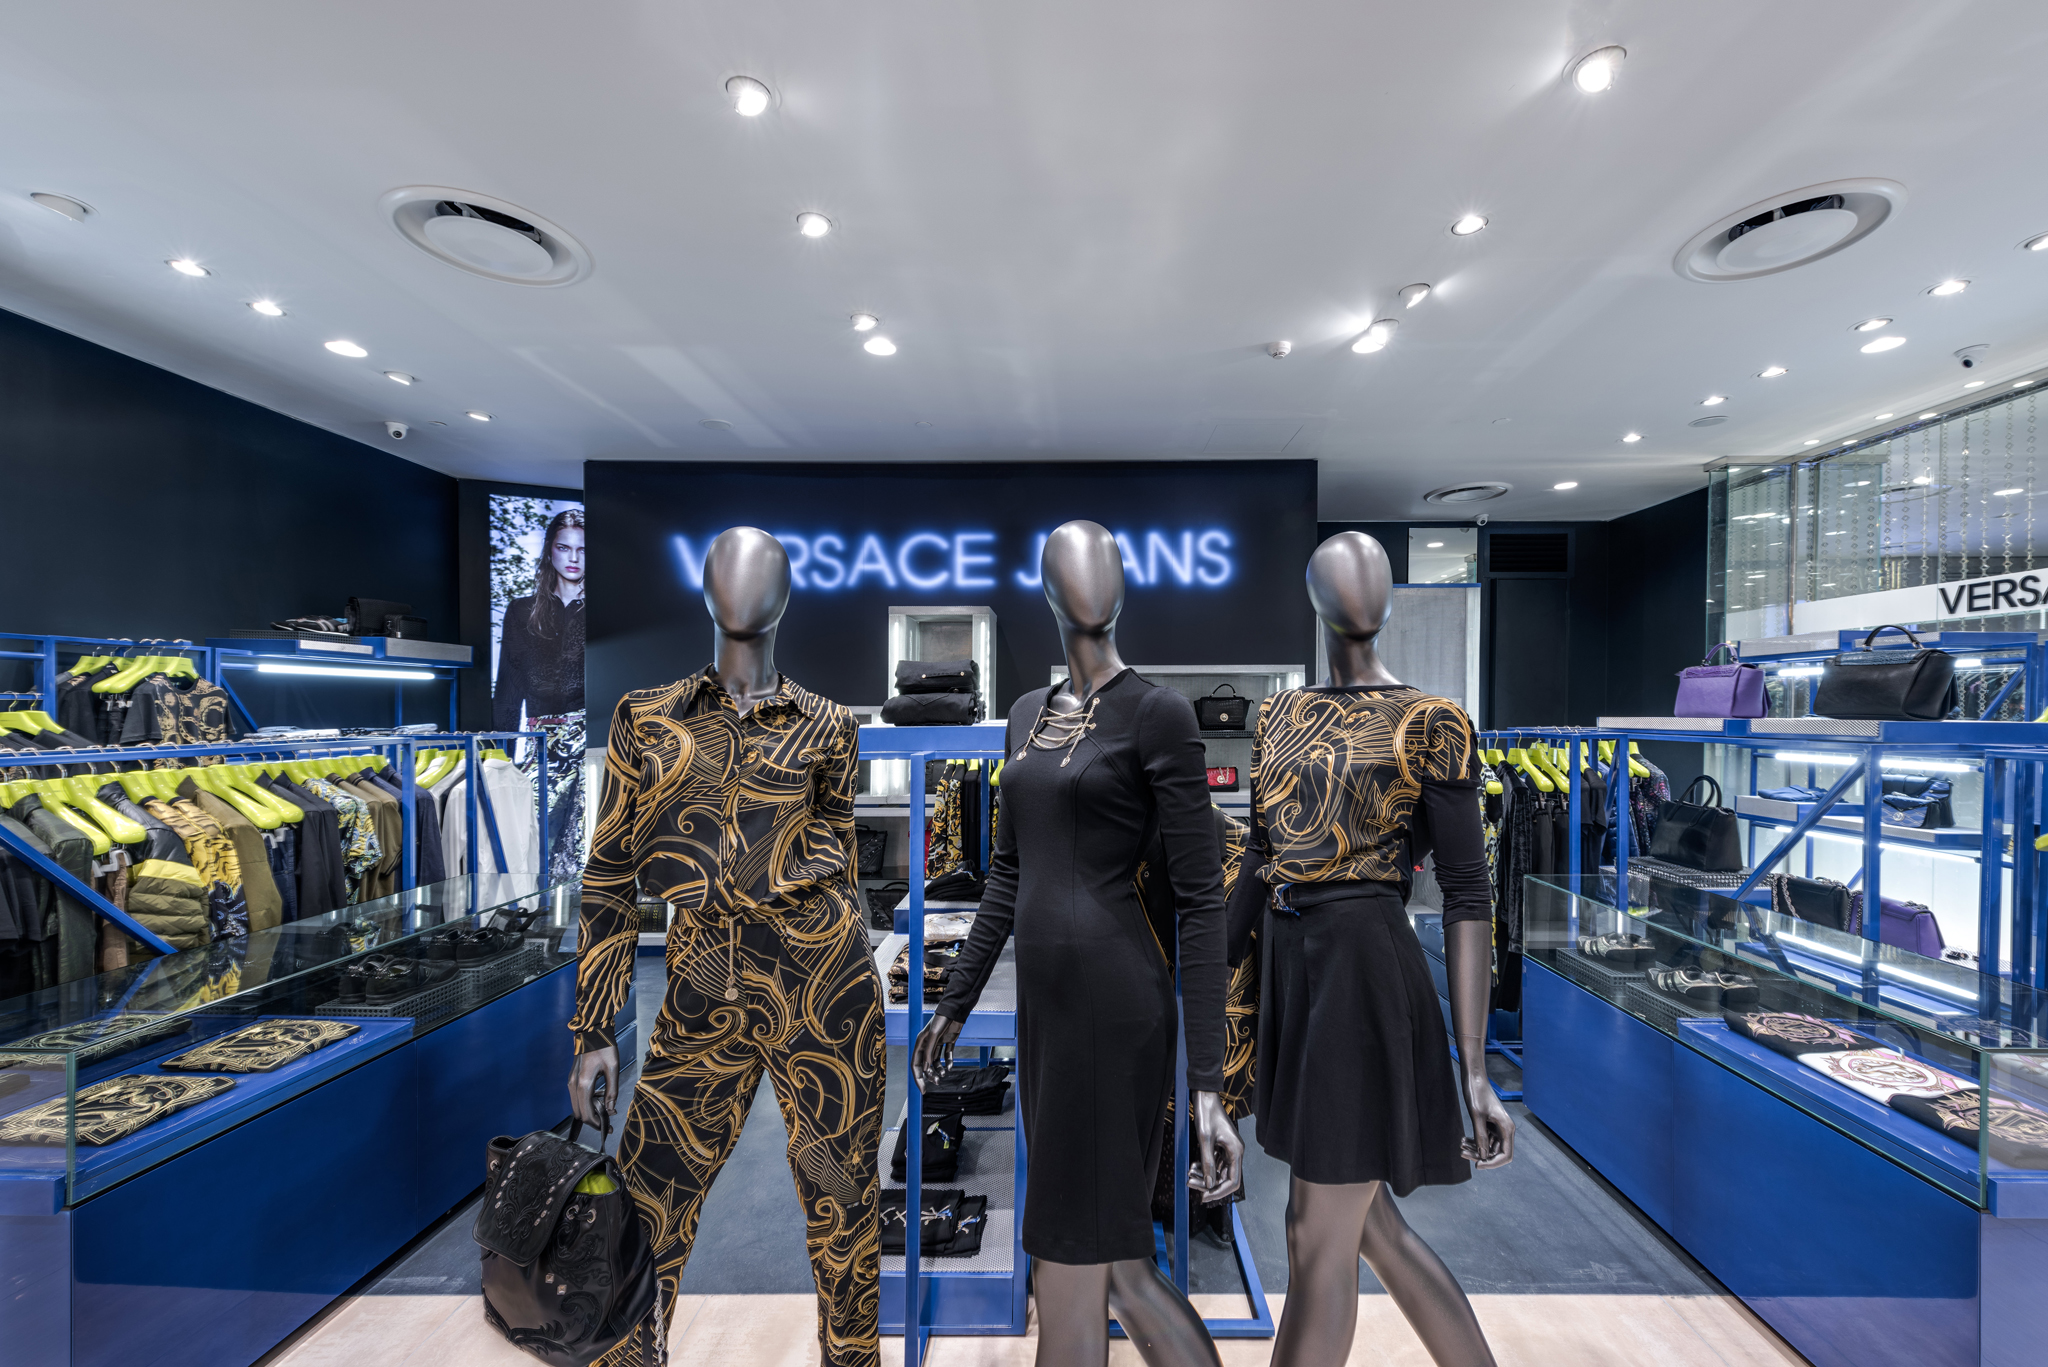 20160729 - Versace Jean - HCM - Commercial - Interior - Store - Retouch 0005.jpg